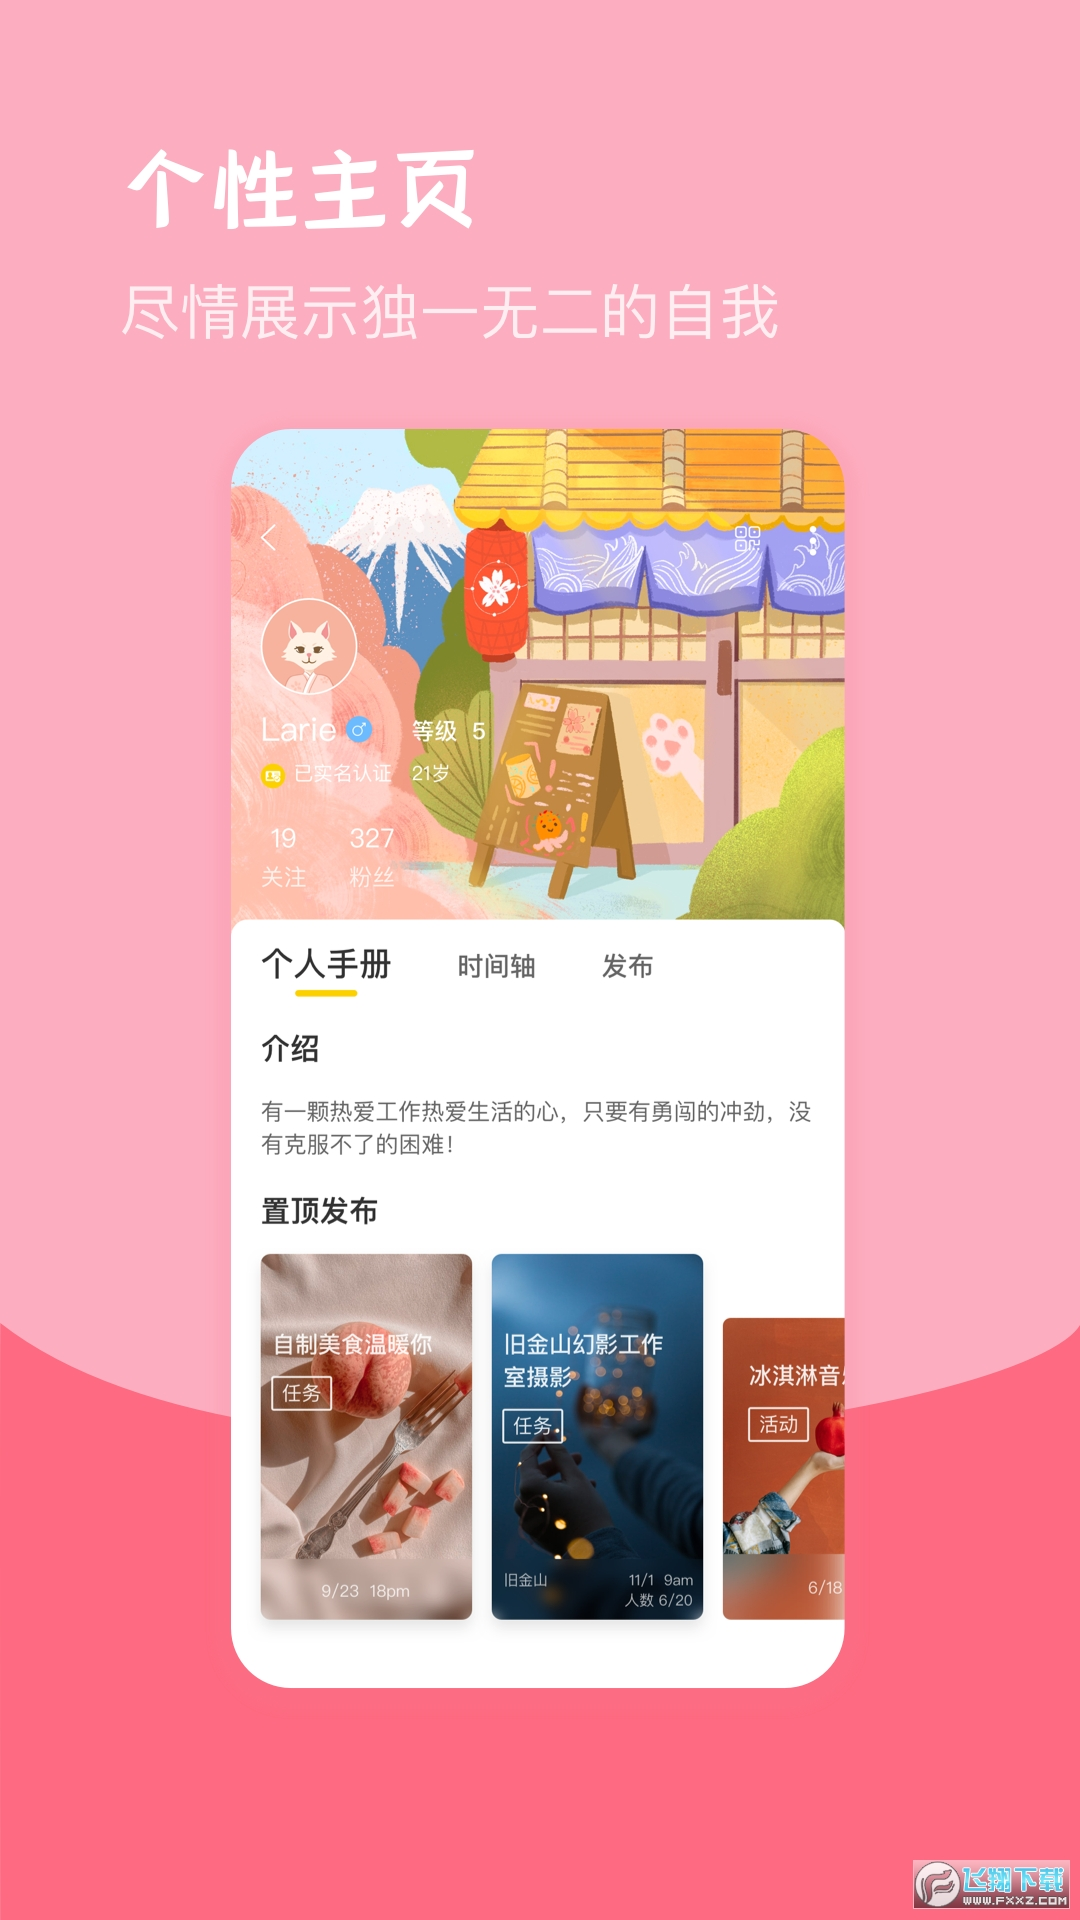 Jumpin社交appv3.1.0安卓版截图1